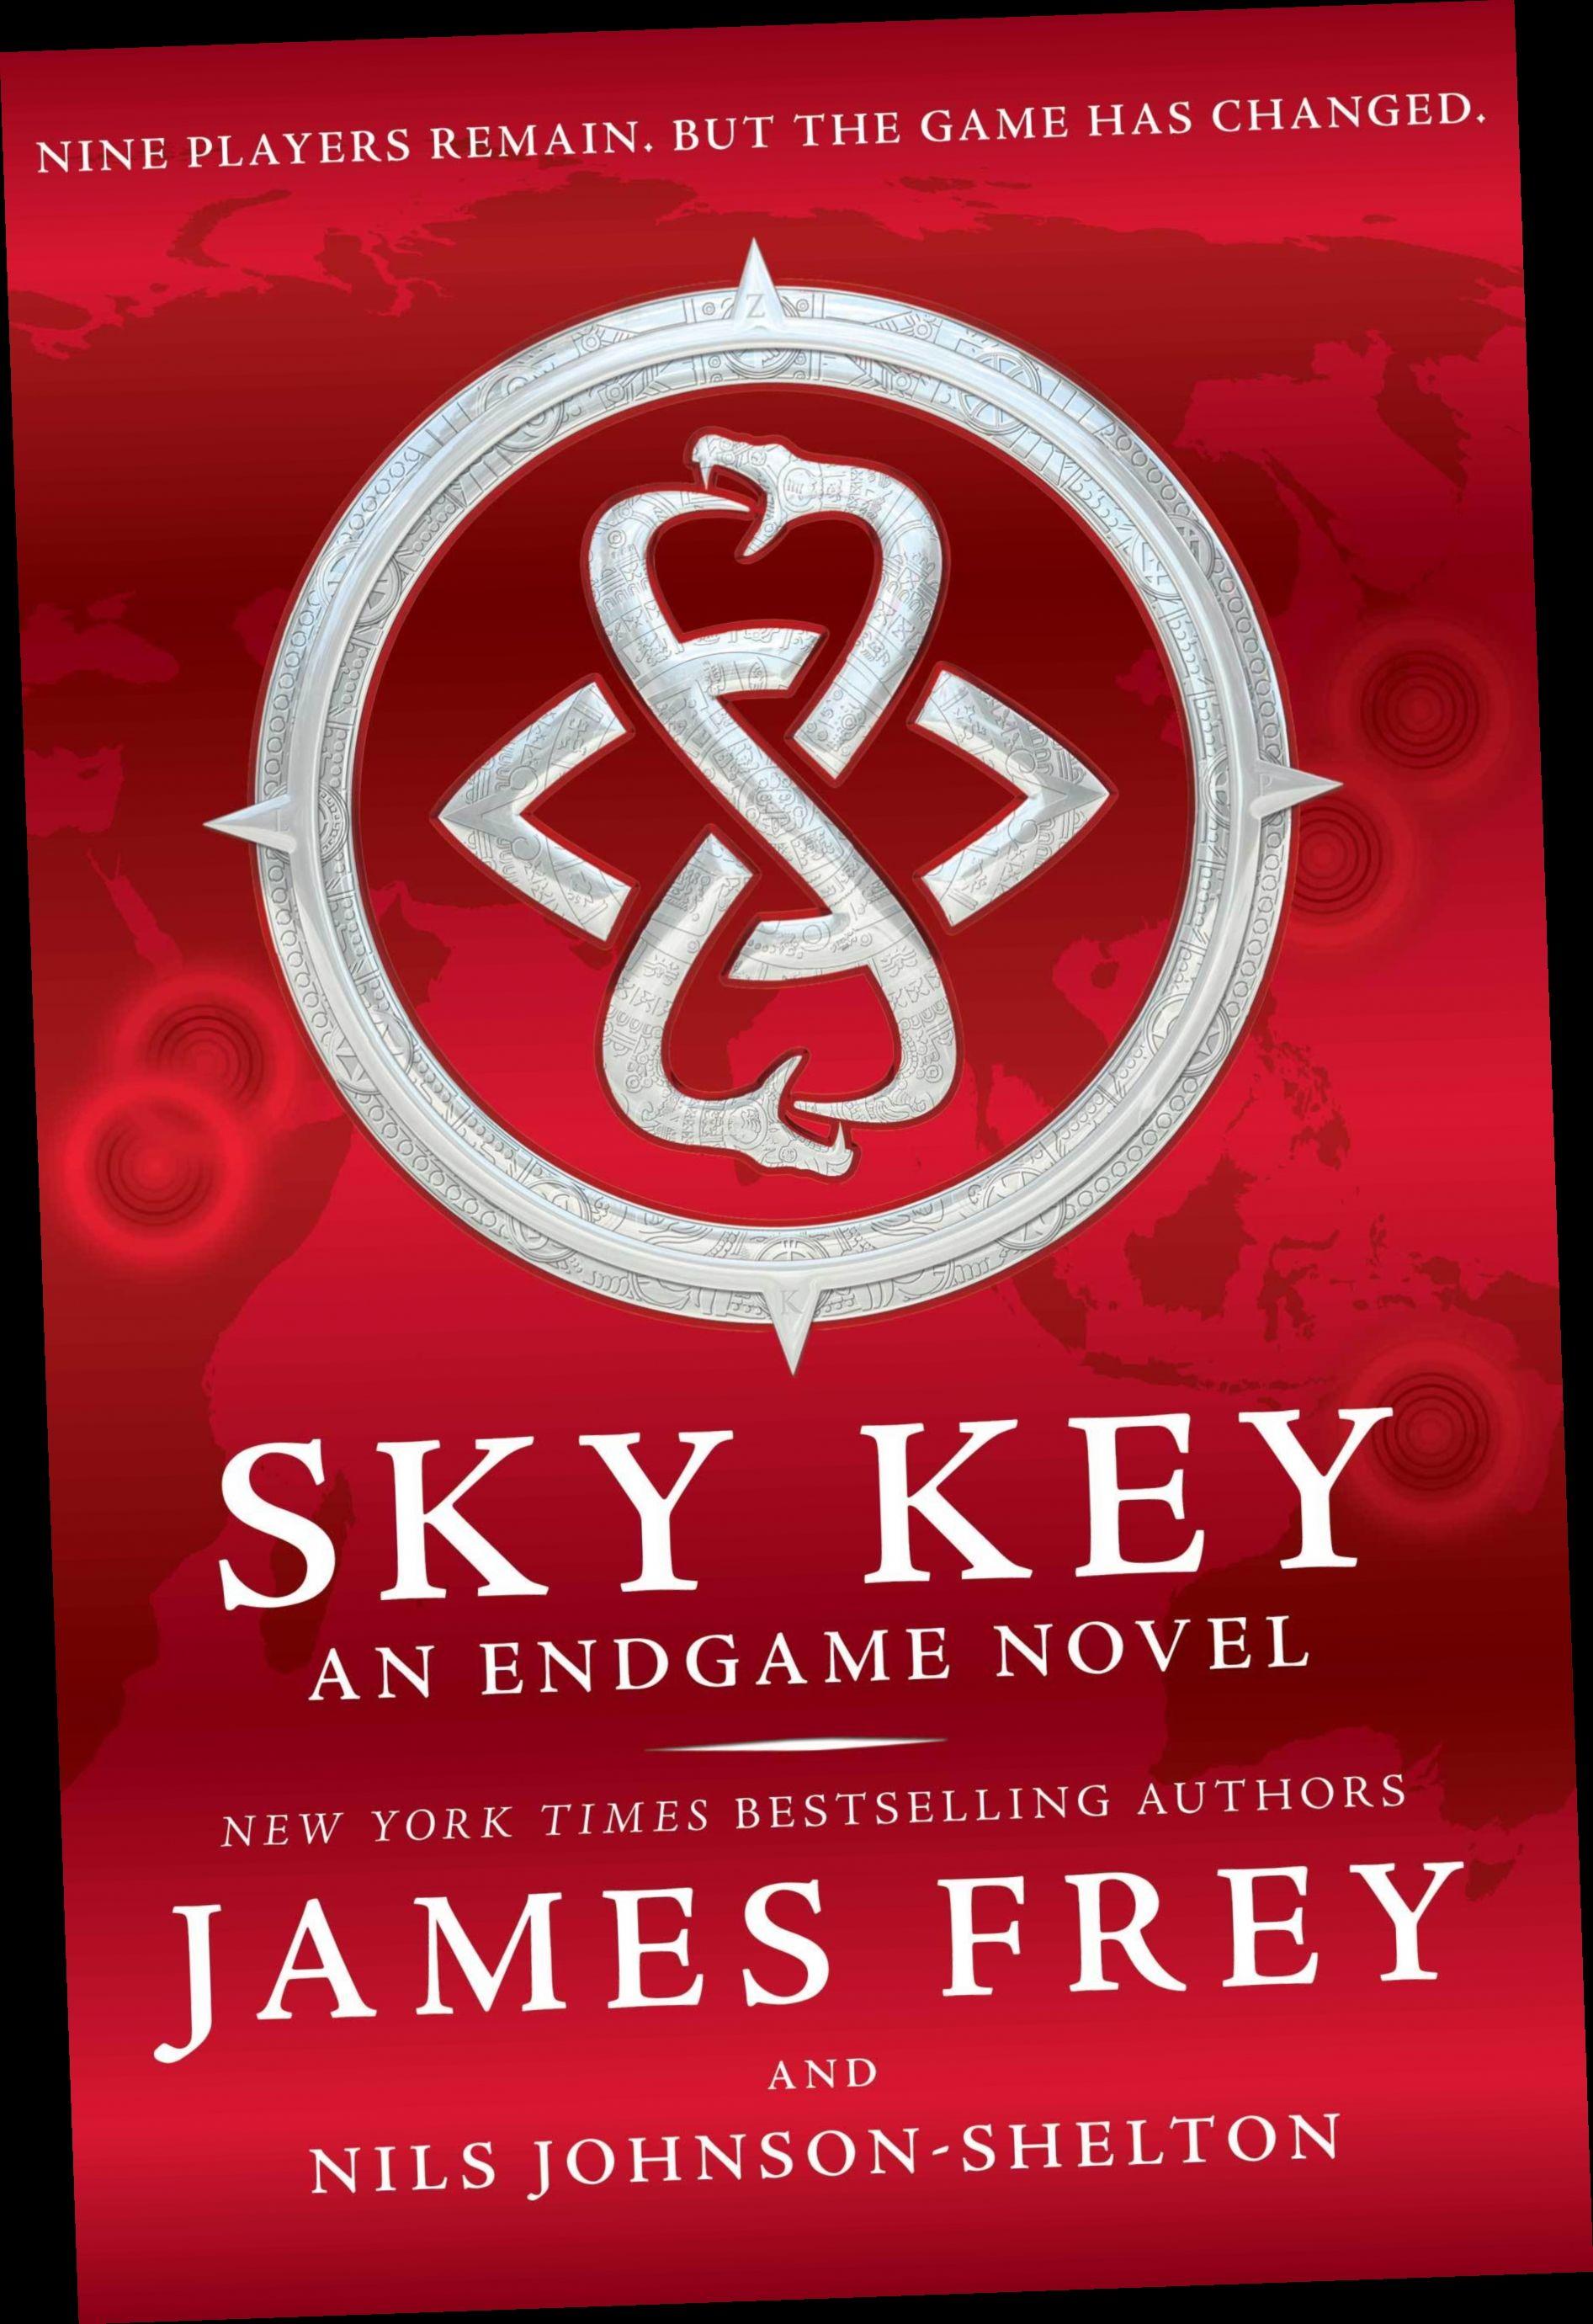 Ebook Pdf Epub Download Sky Key By James Frey James Frey Endgame Book Frey